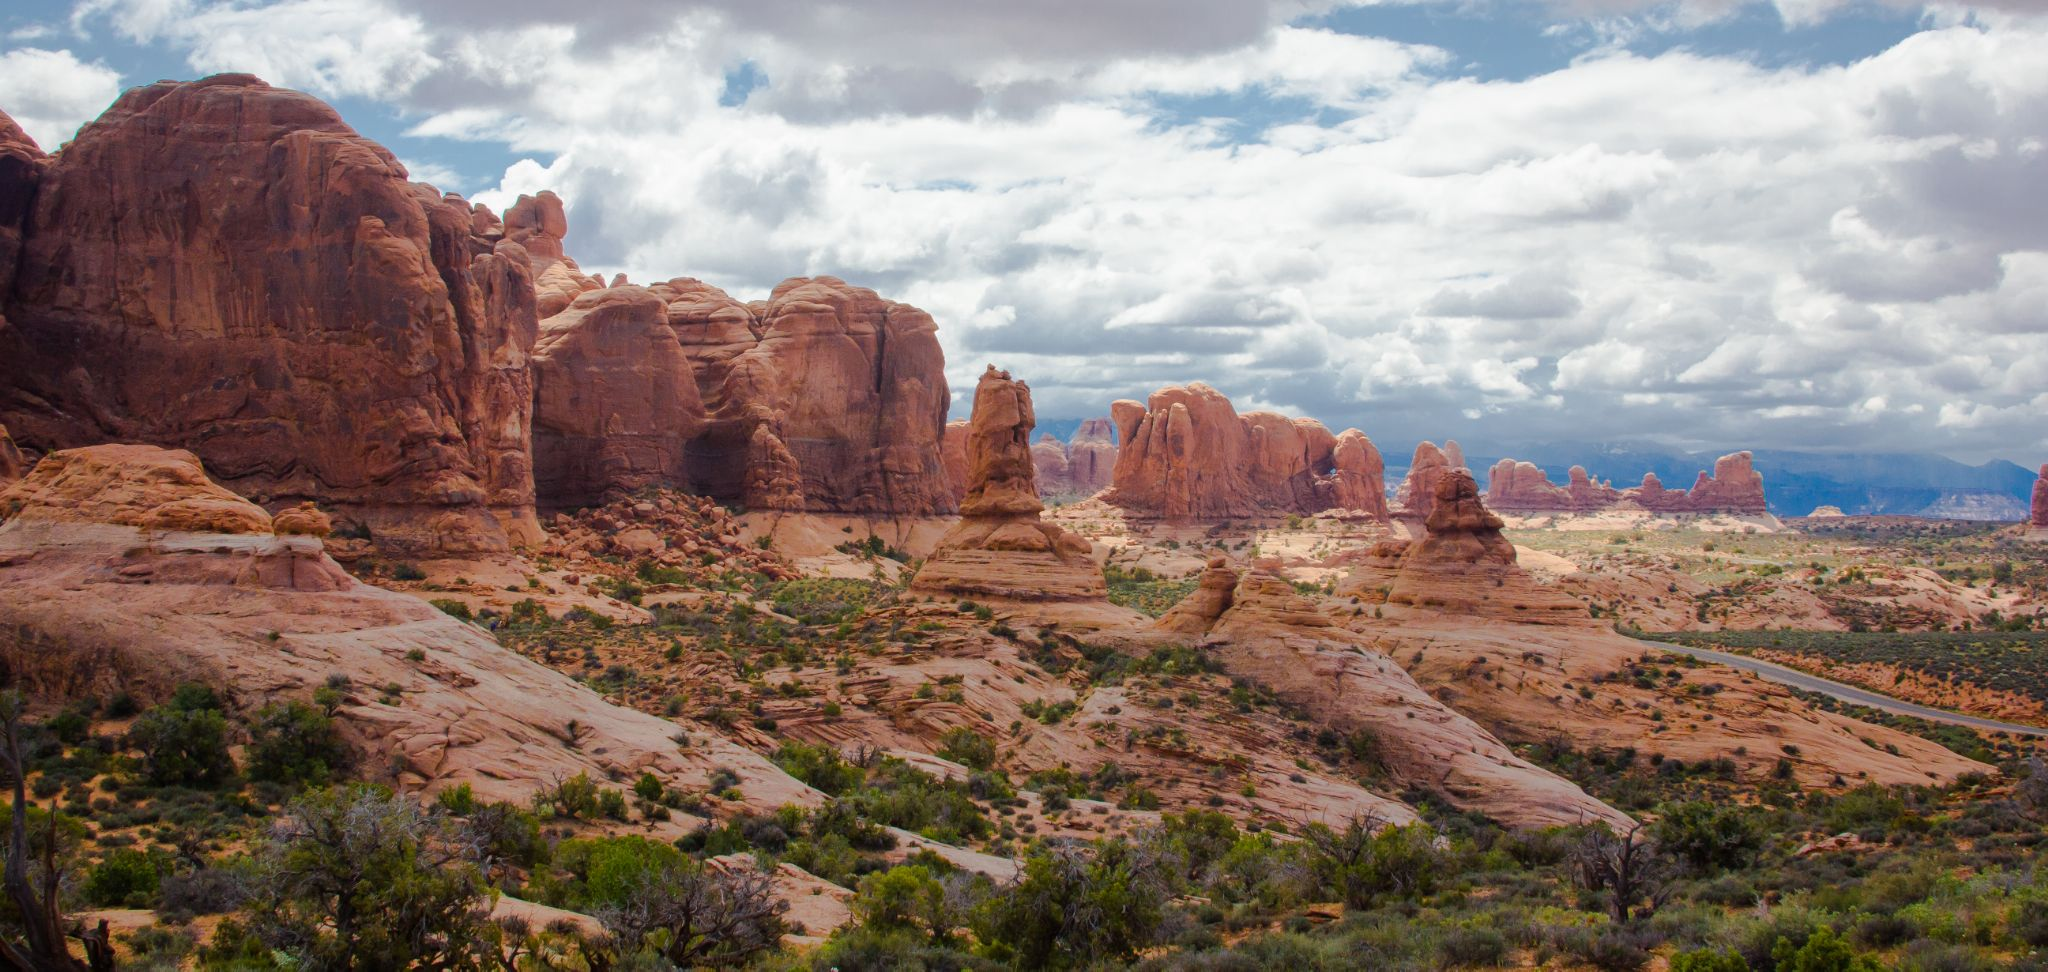 Utah Desert by rogeryounce